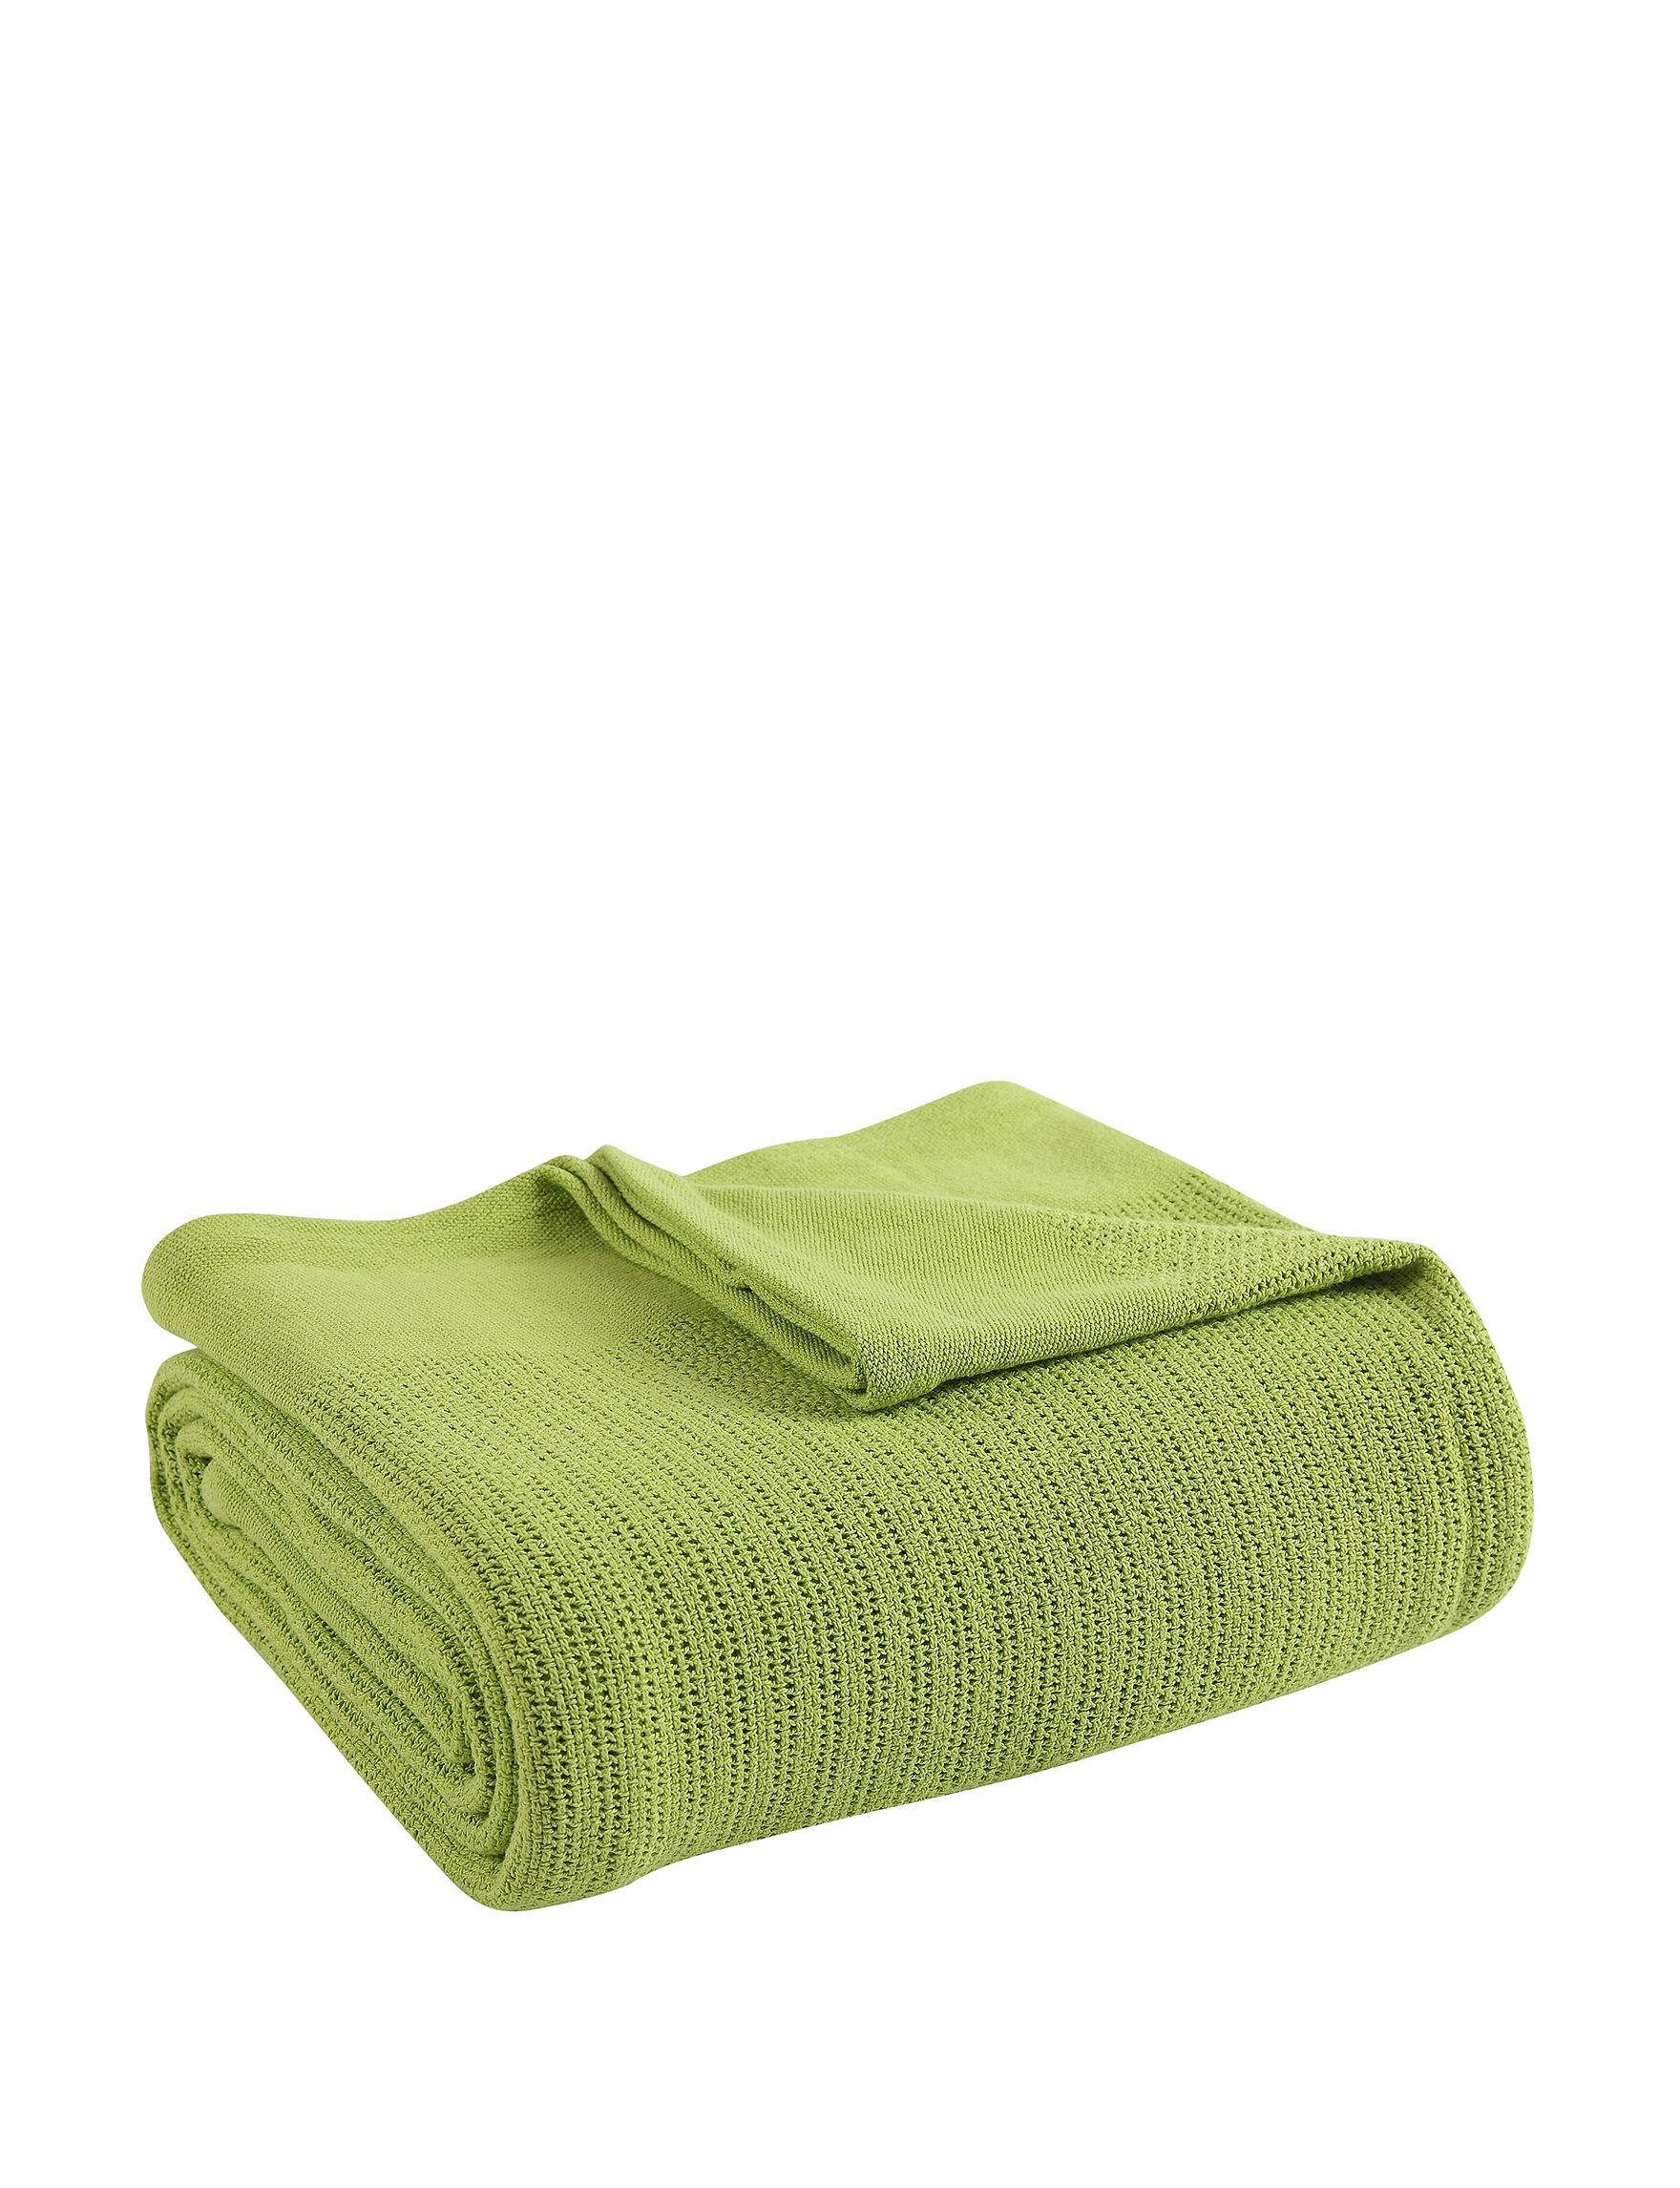 Fiesta Lime Blankets & Throws